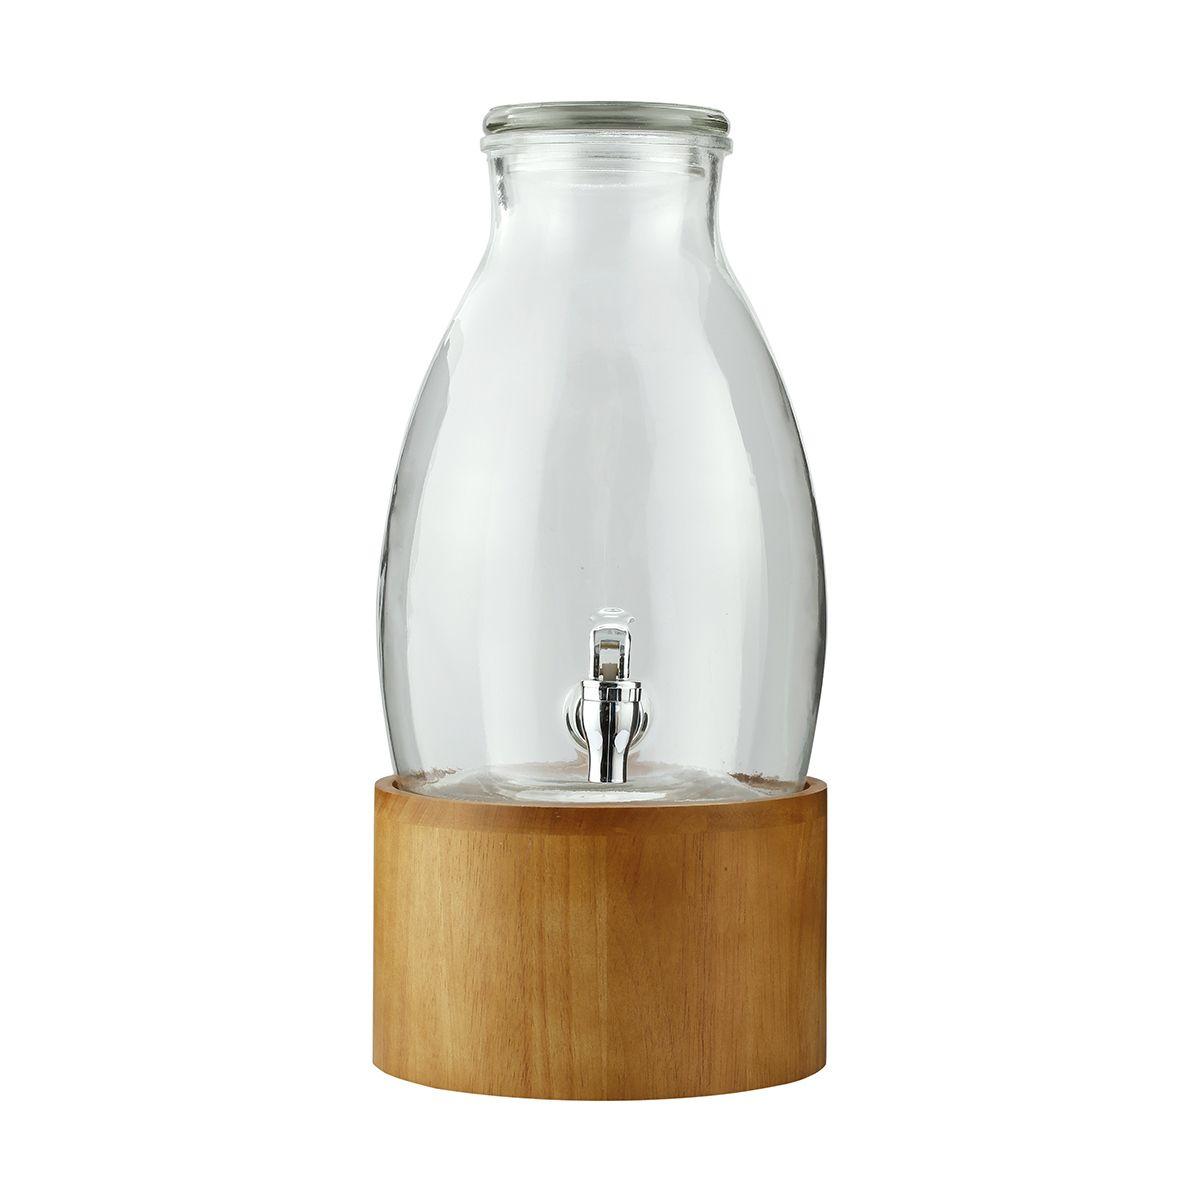 Dispenser with rubber wood stand kmart wine dispenser